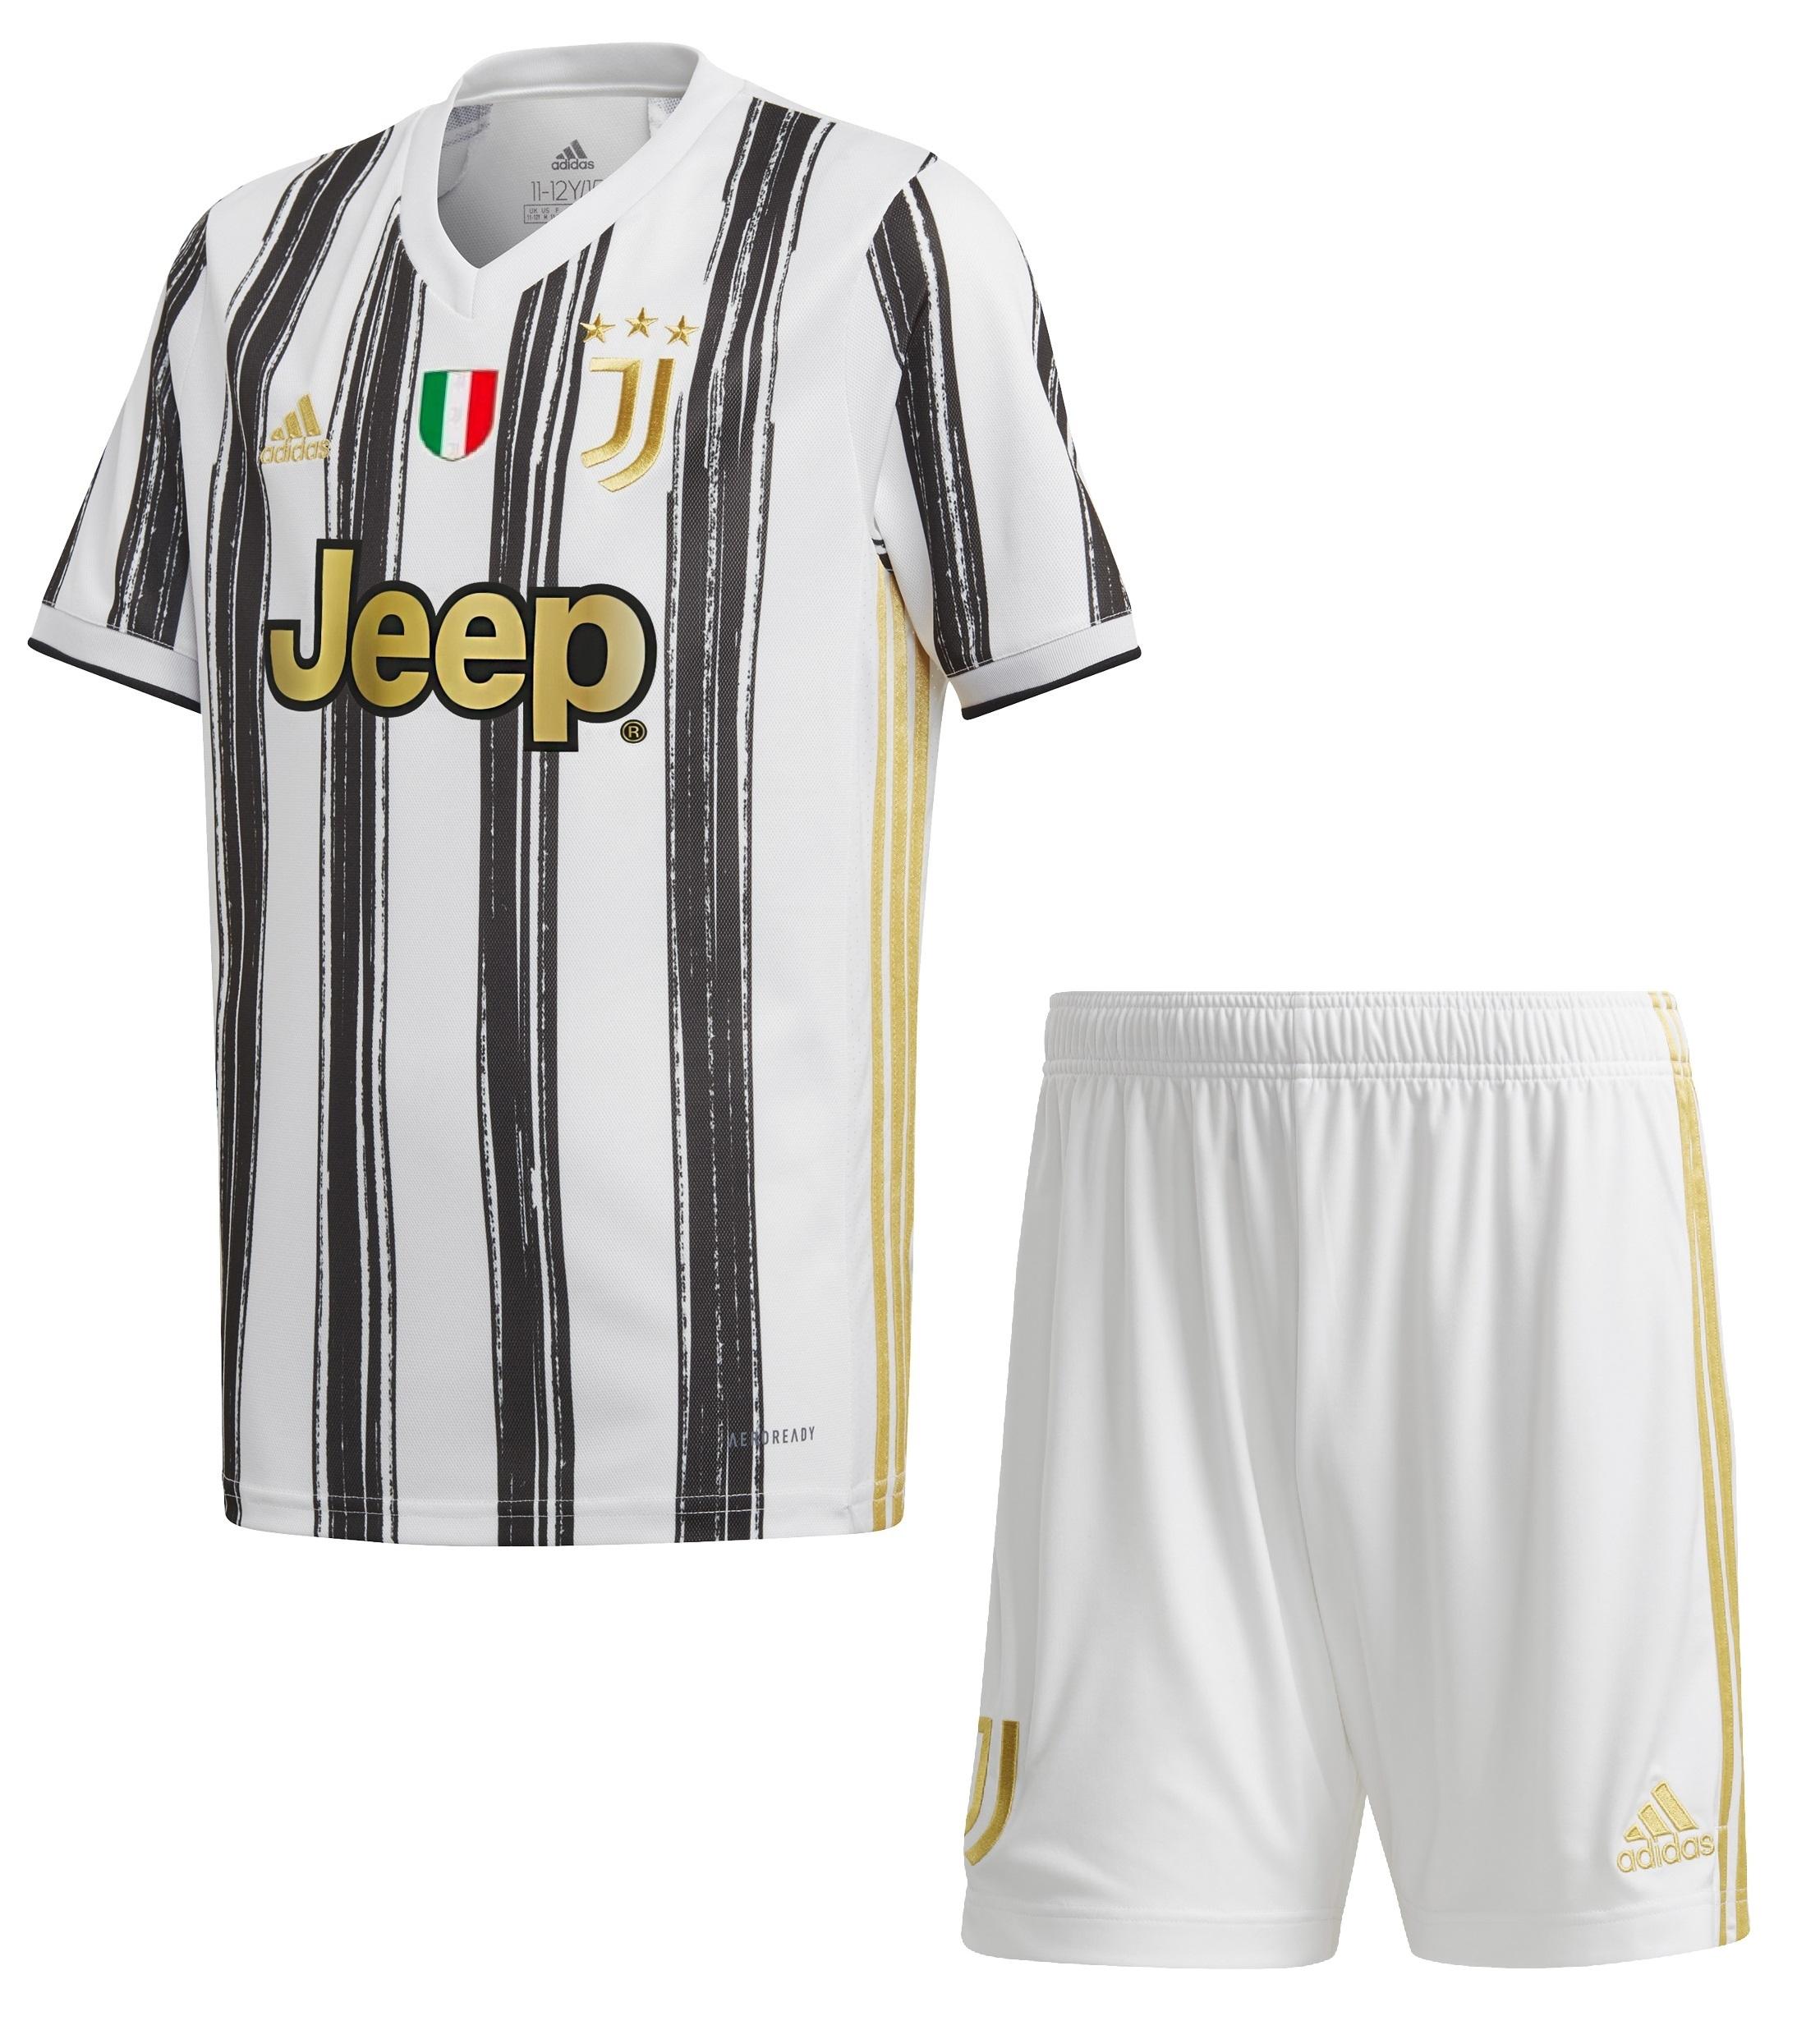 JUVENTUS COMPLETO BAMBINO HOME 7-16 anni 2020-21 | CalcioItalia.com